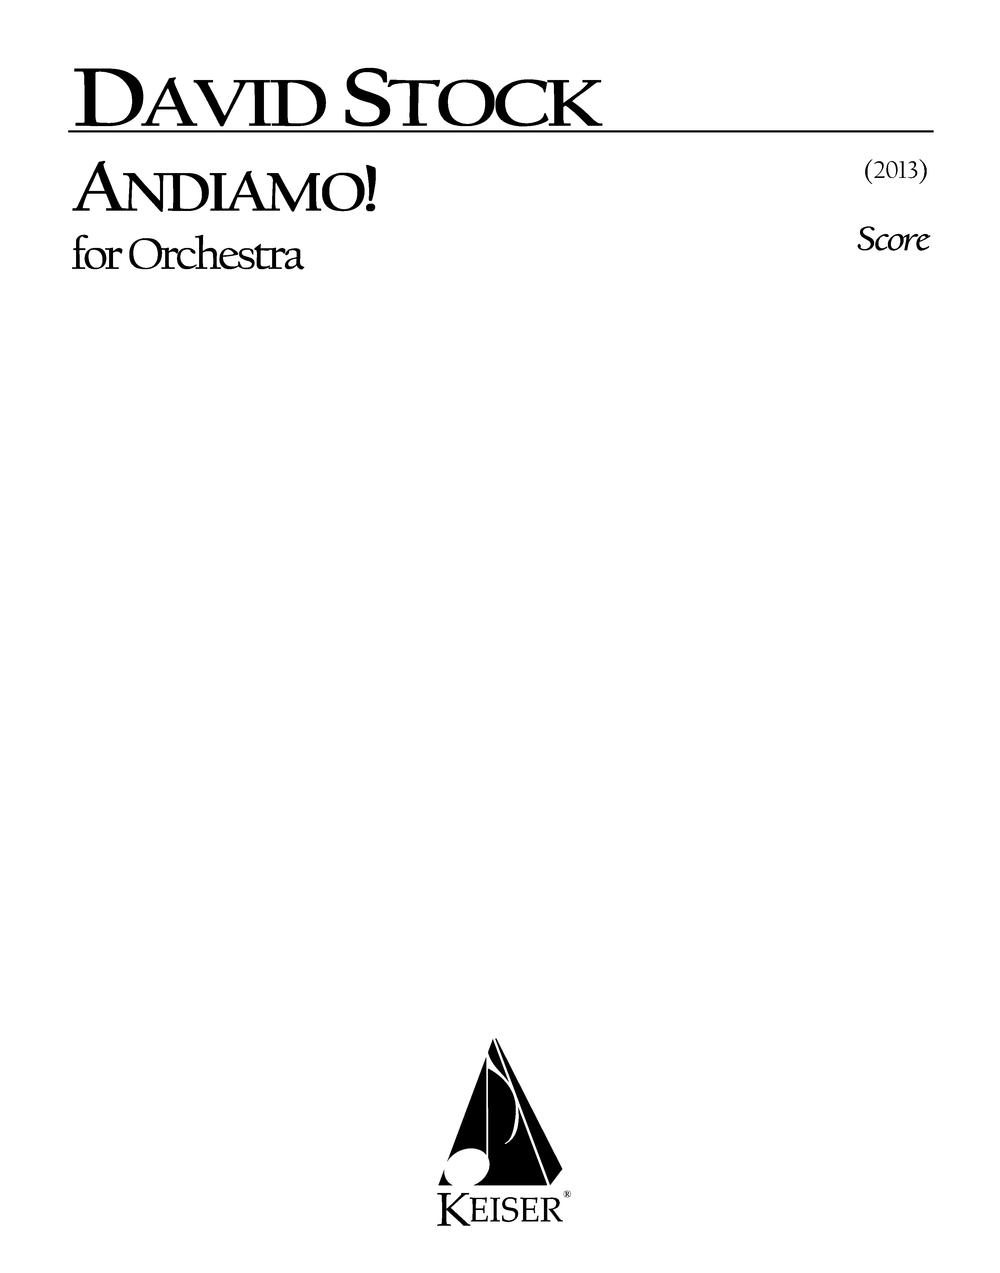 Andiamo!(2013)   - 3 (3dPicc).2+1.2+Bcl.2: 4.3.3.1: Timp.Perc(3): StrRent/Buy:Keiser Music